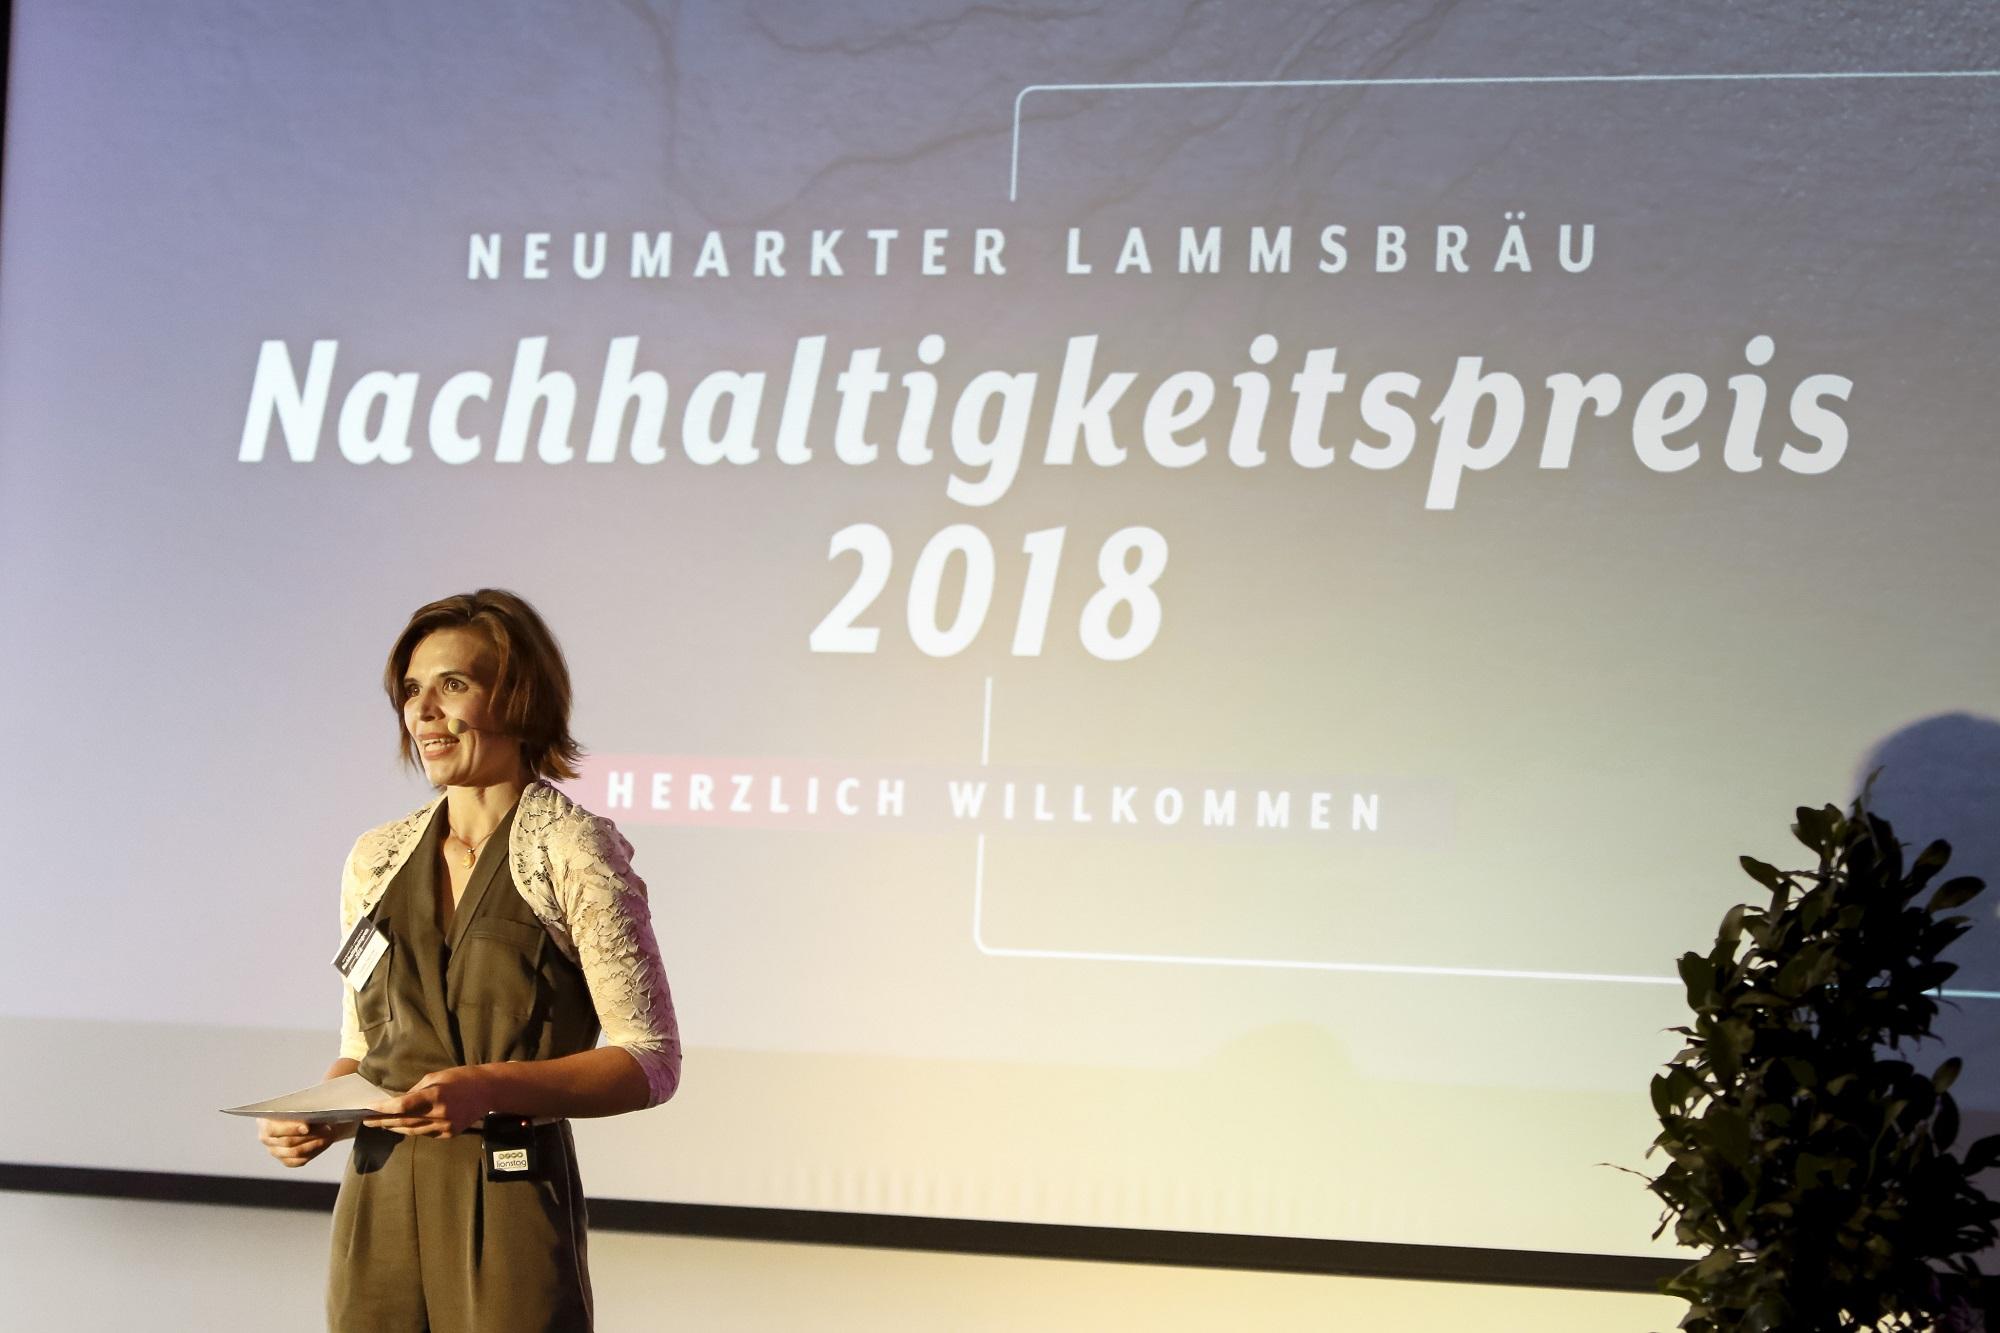 Preisverleihung Neumarkter Lammsbräu, Moderatorin Violetta Paprotta